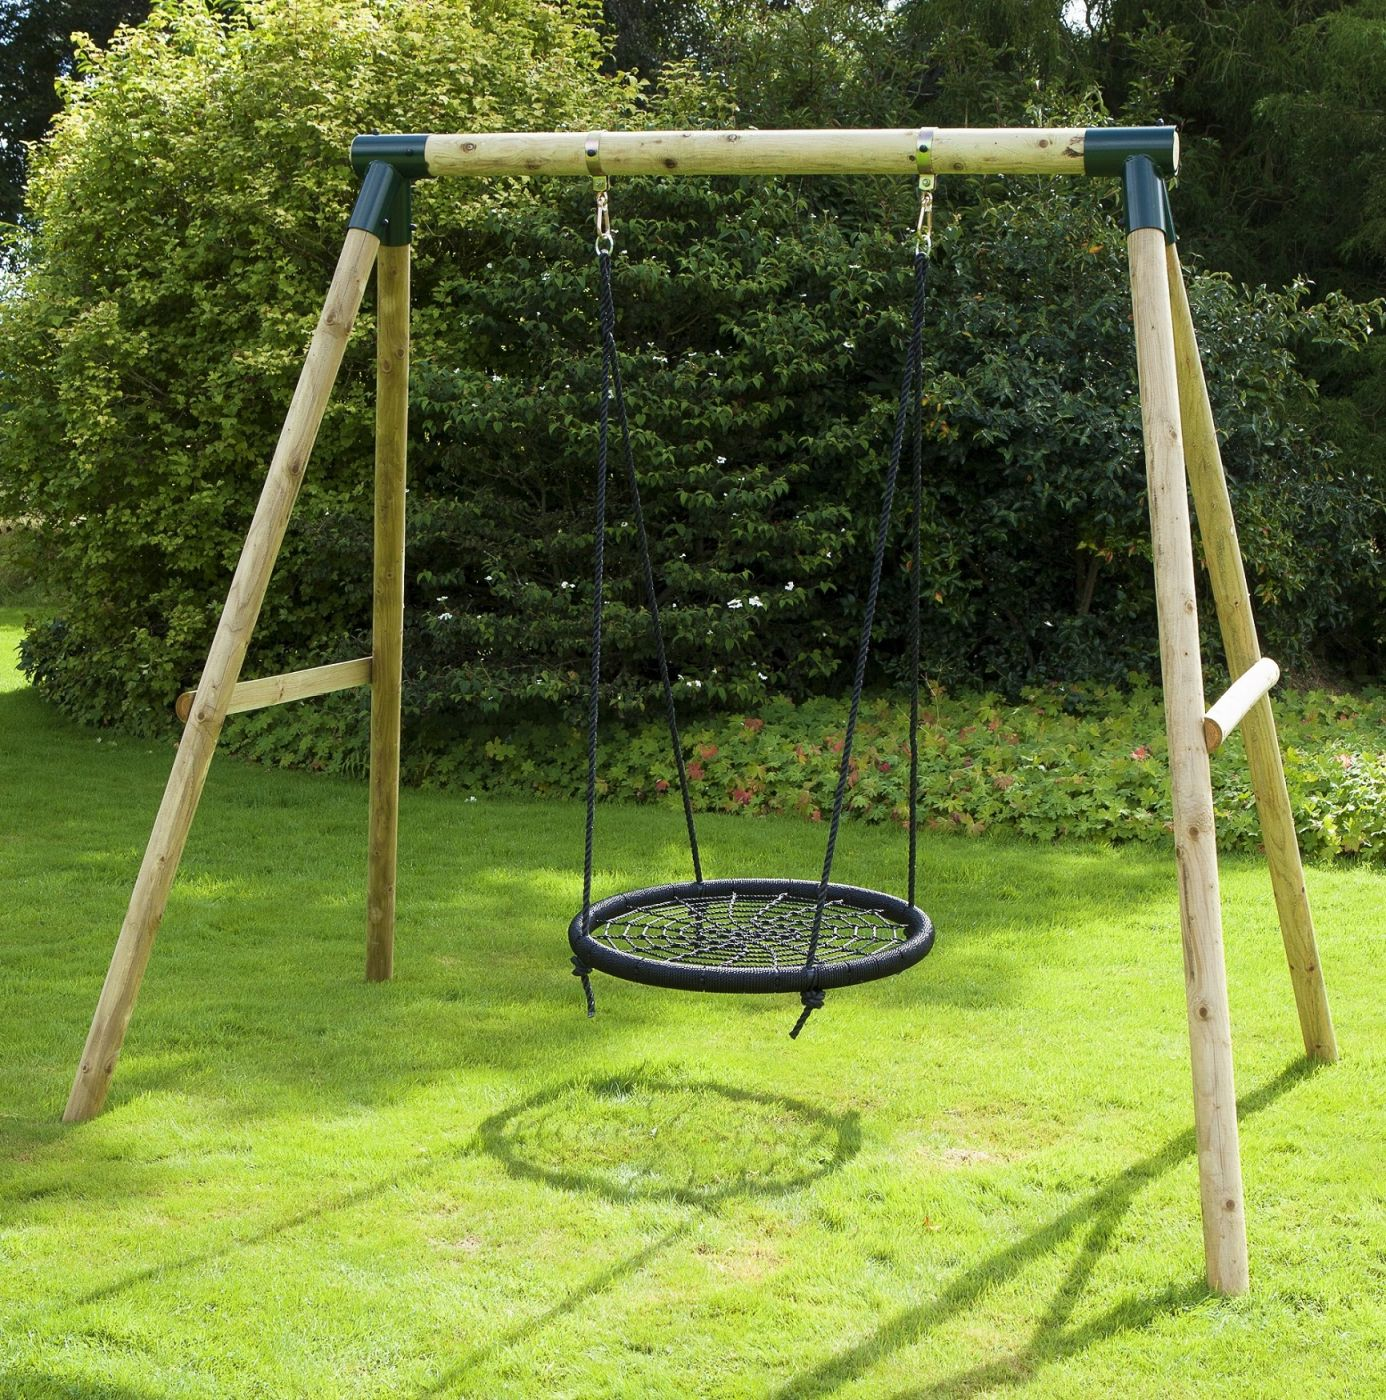 Rebo Mercury Wooden Garden Swing Set For Just 169 95 Outdoor Toys